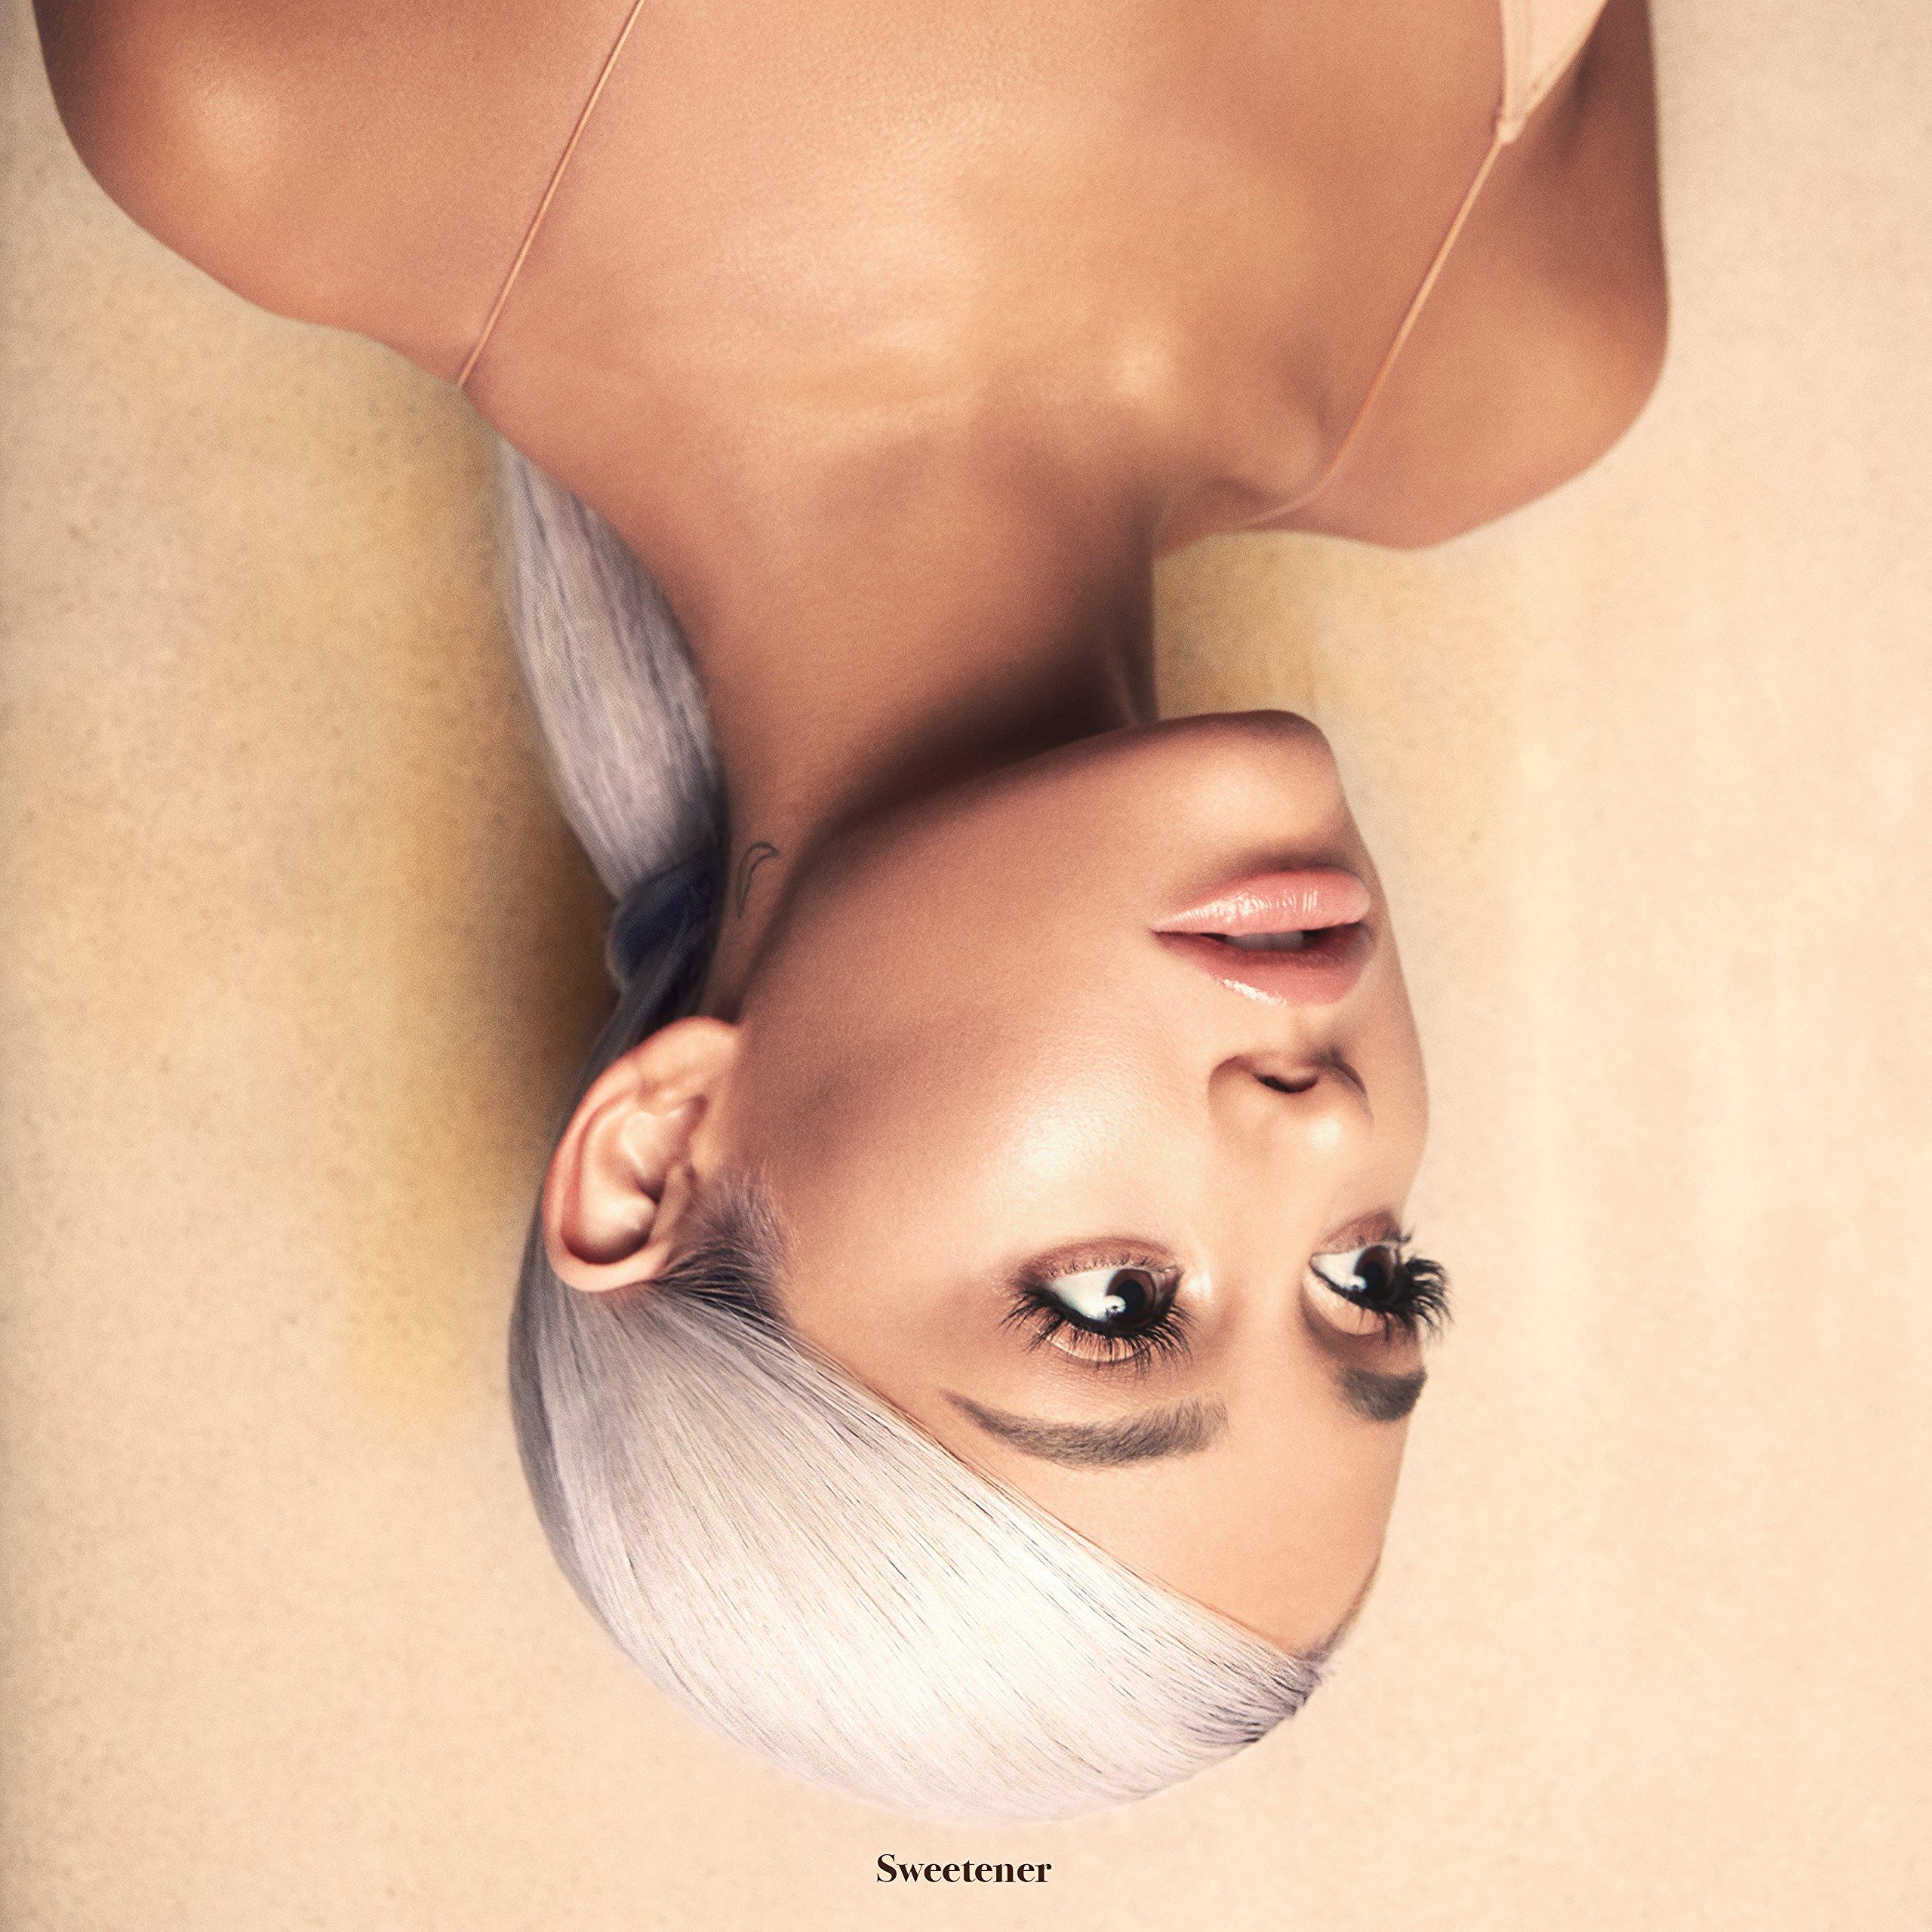 CD : Ariana Grande - Sweetener (Clean Version)